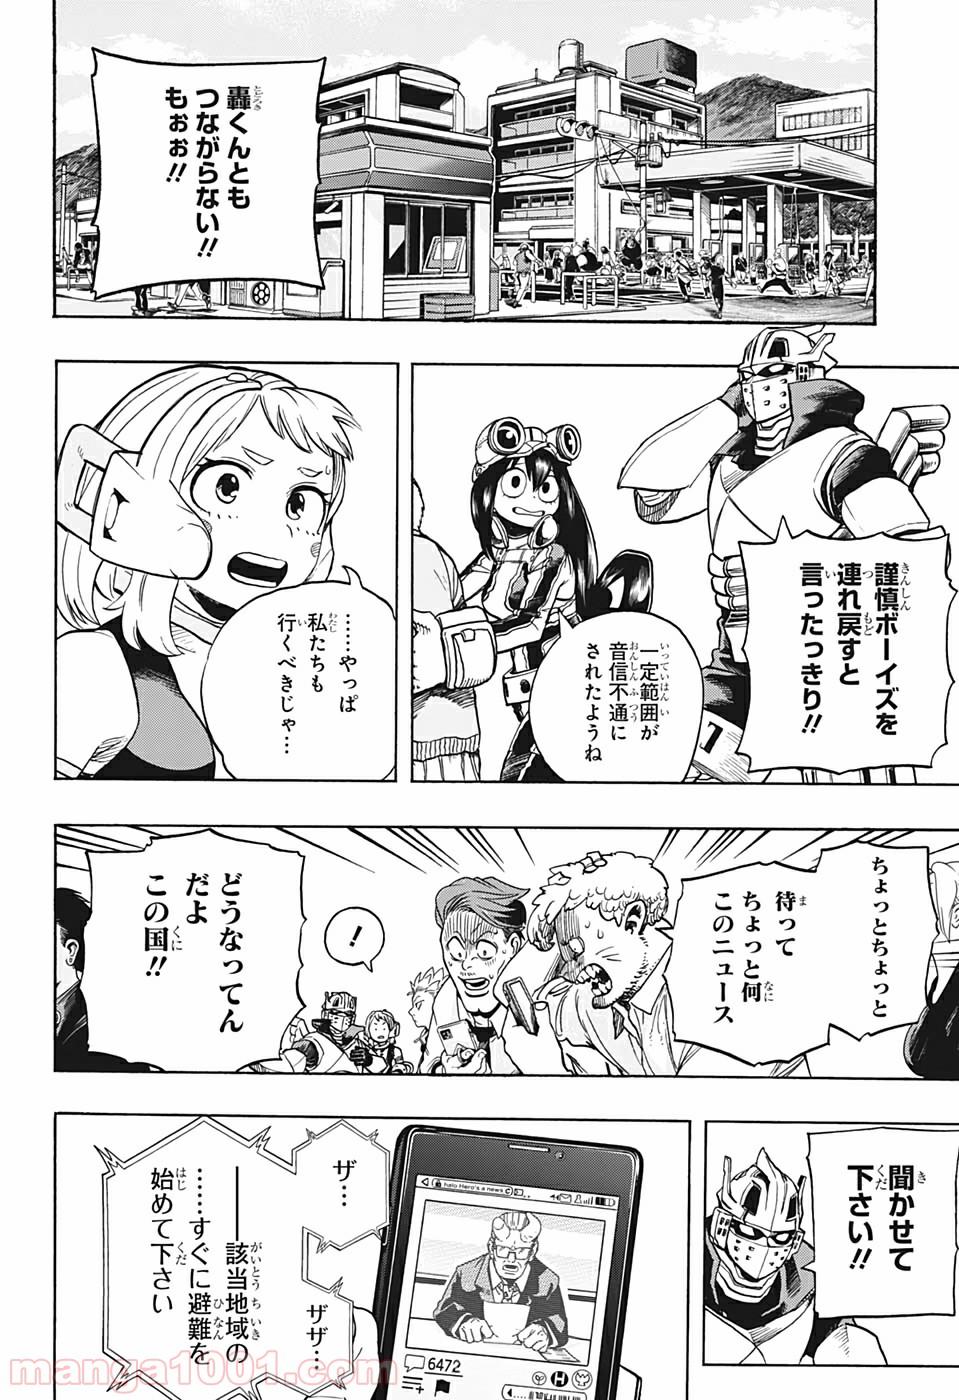 Com Manga1001